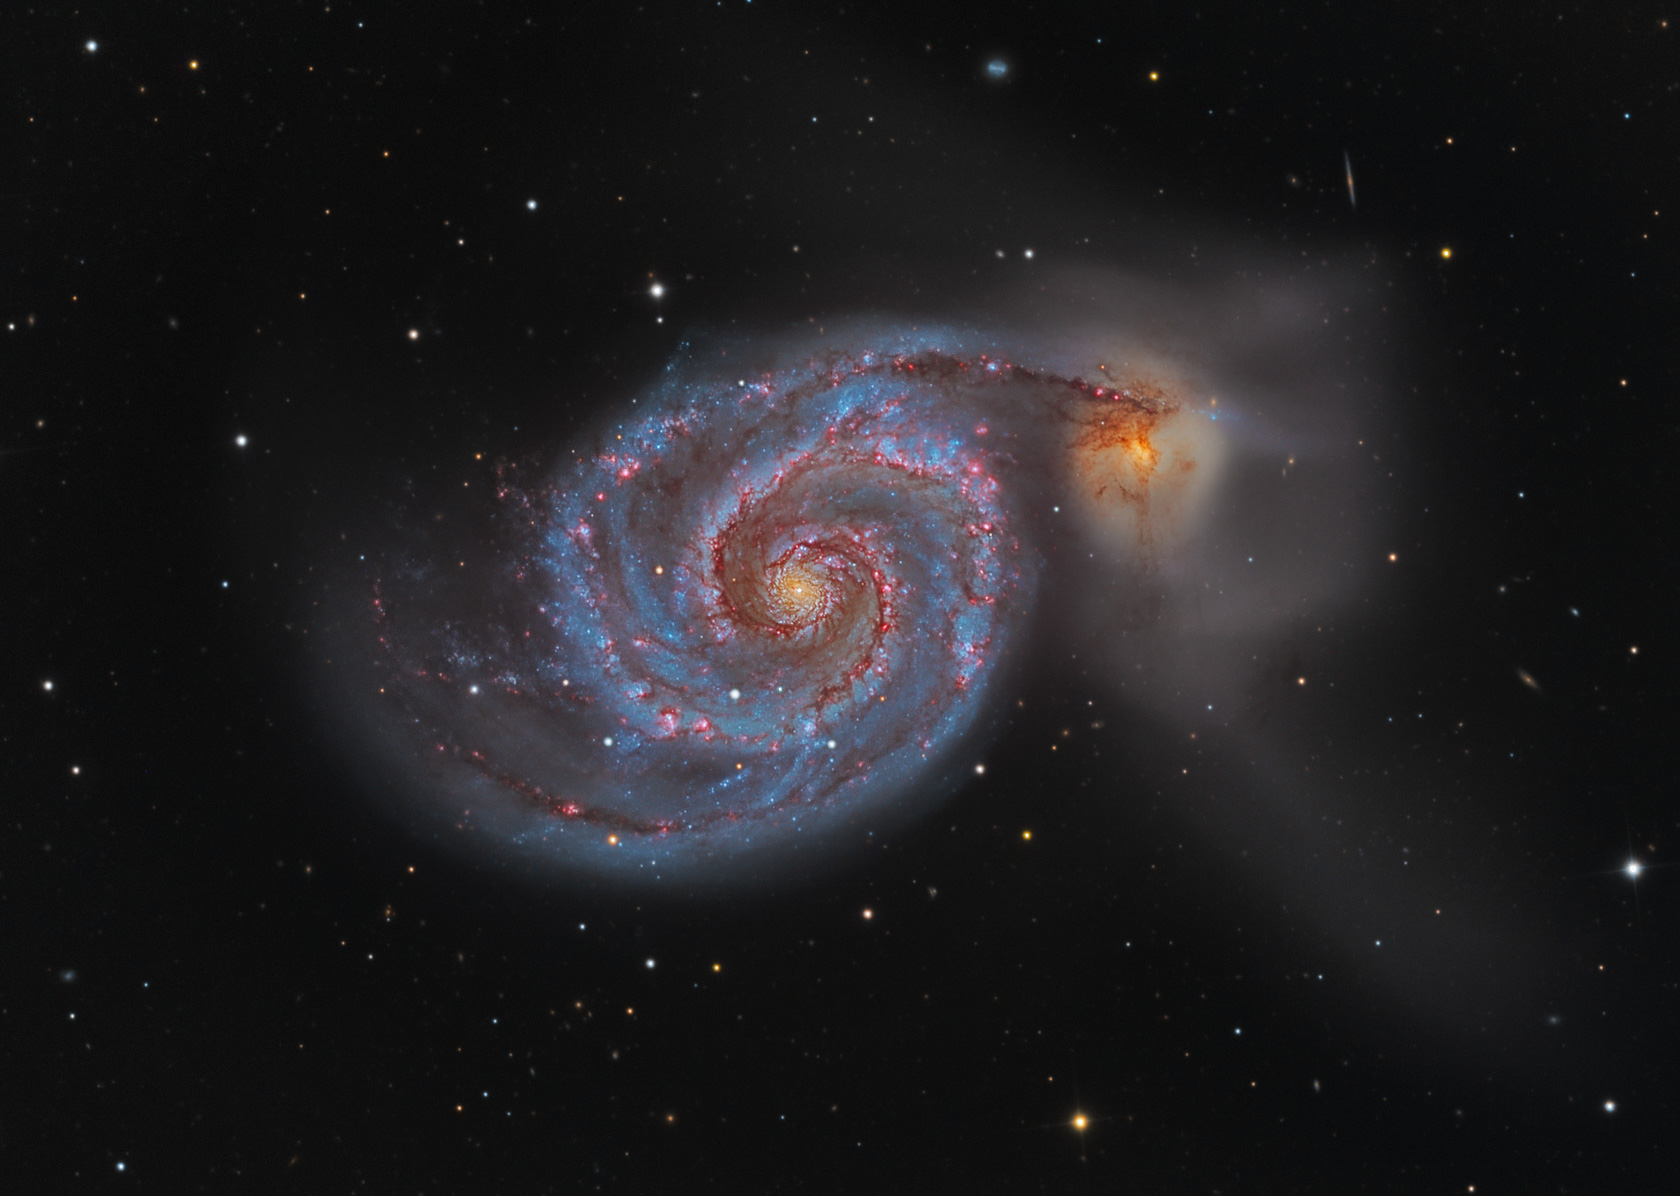 Galaksi pusaran air, M51 / Martin Pugh / NASA